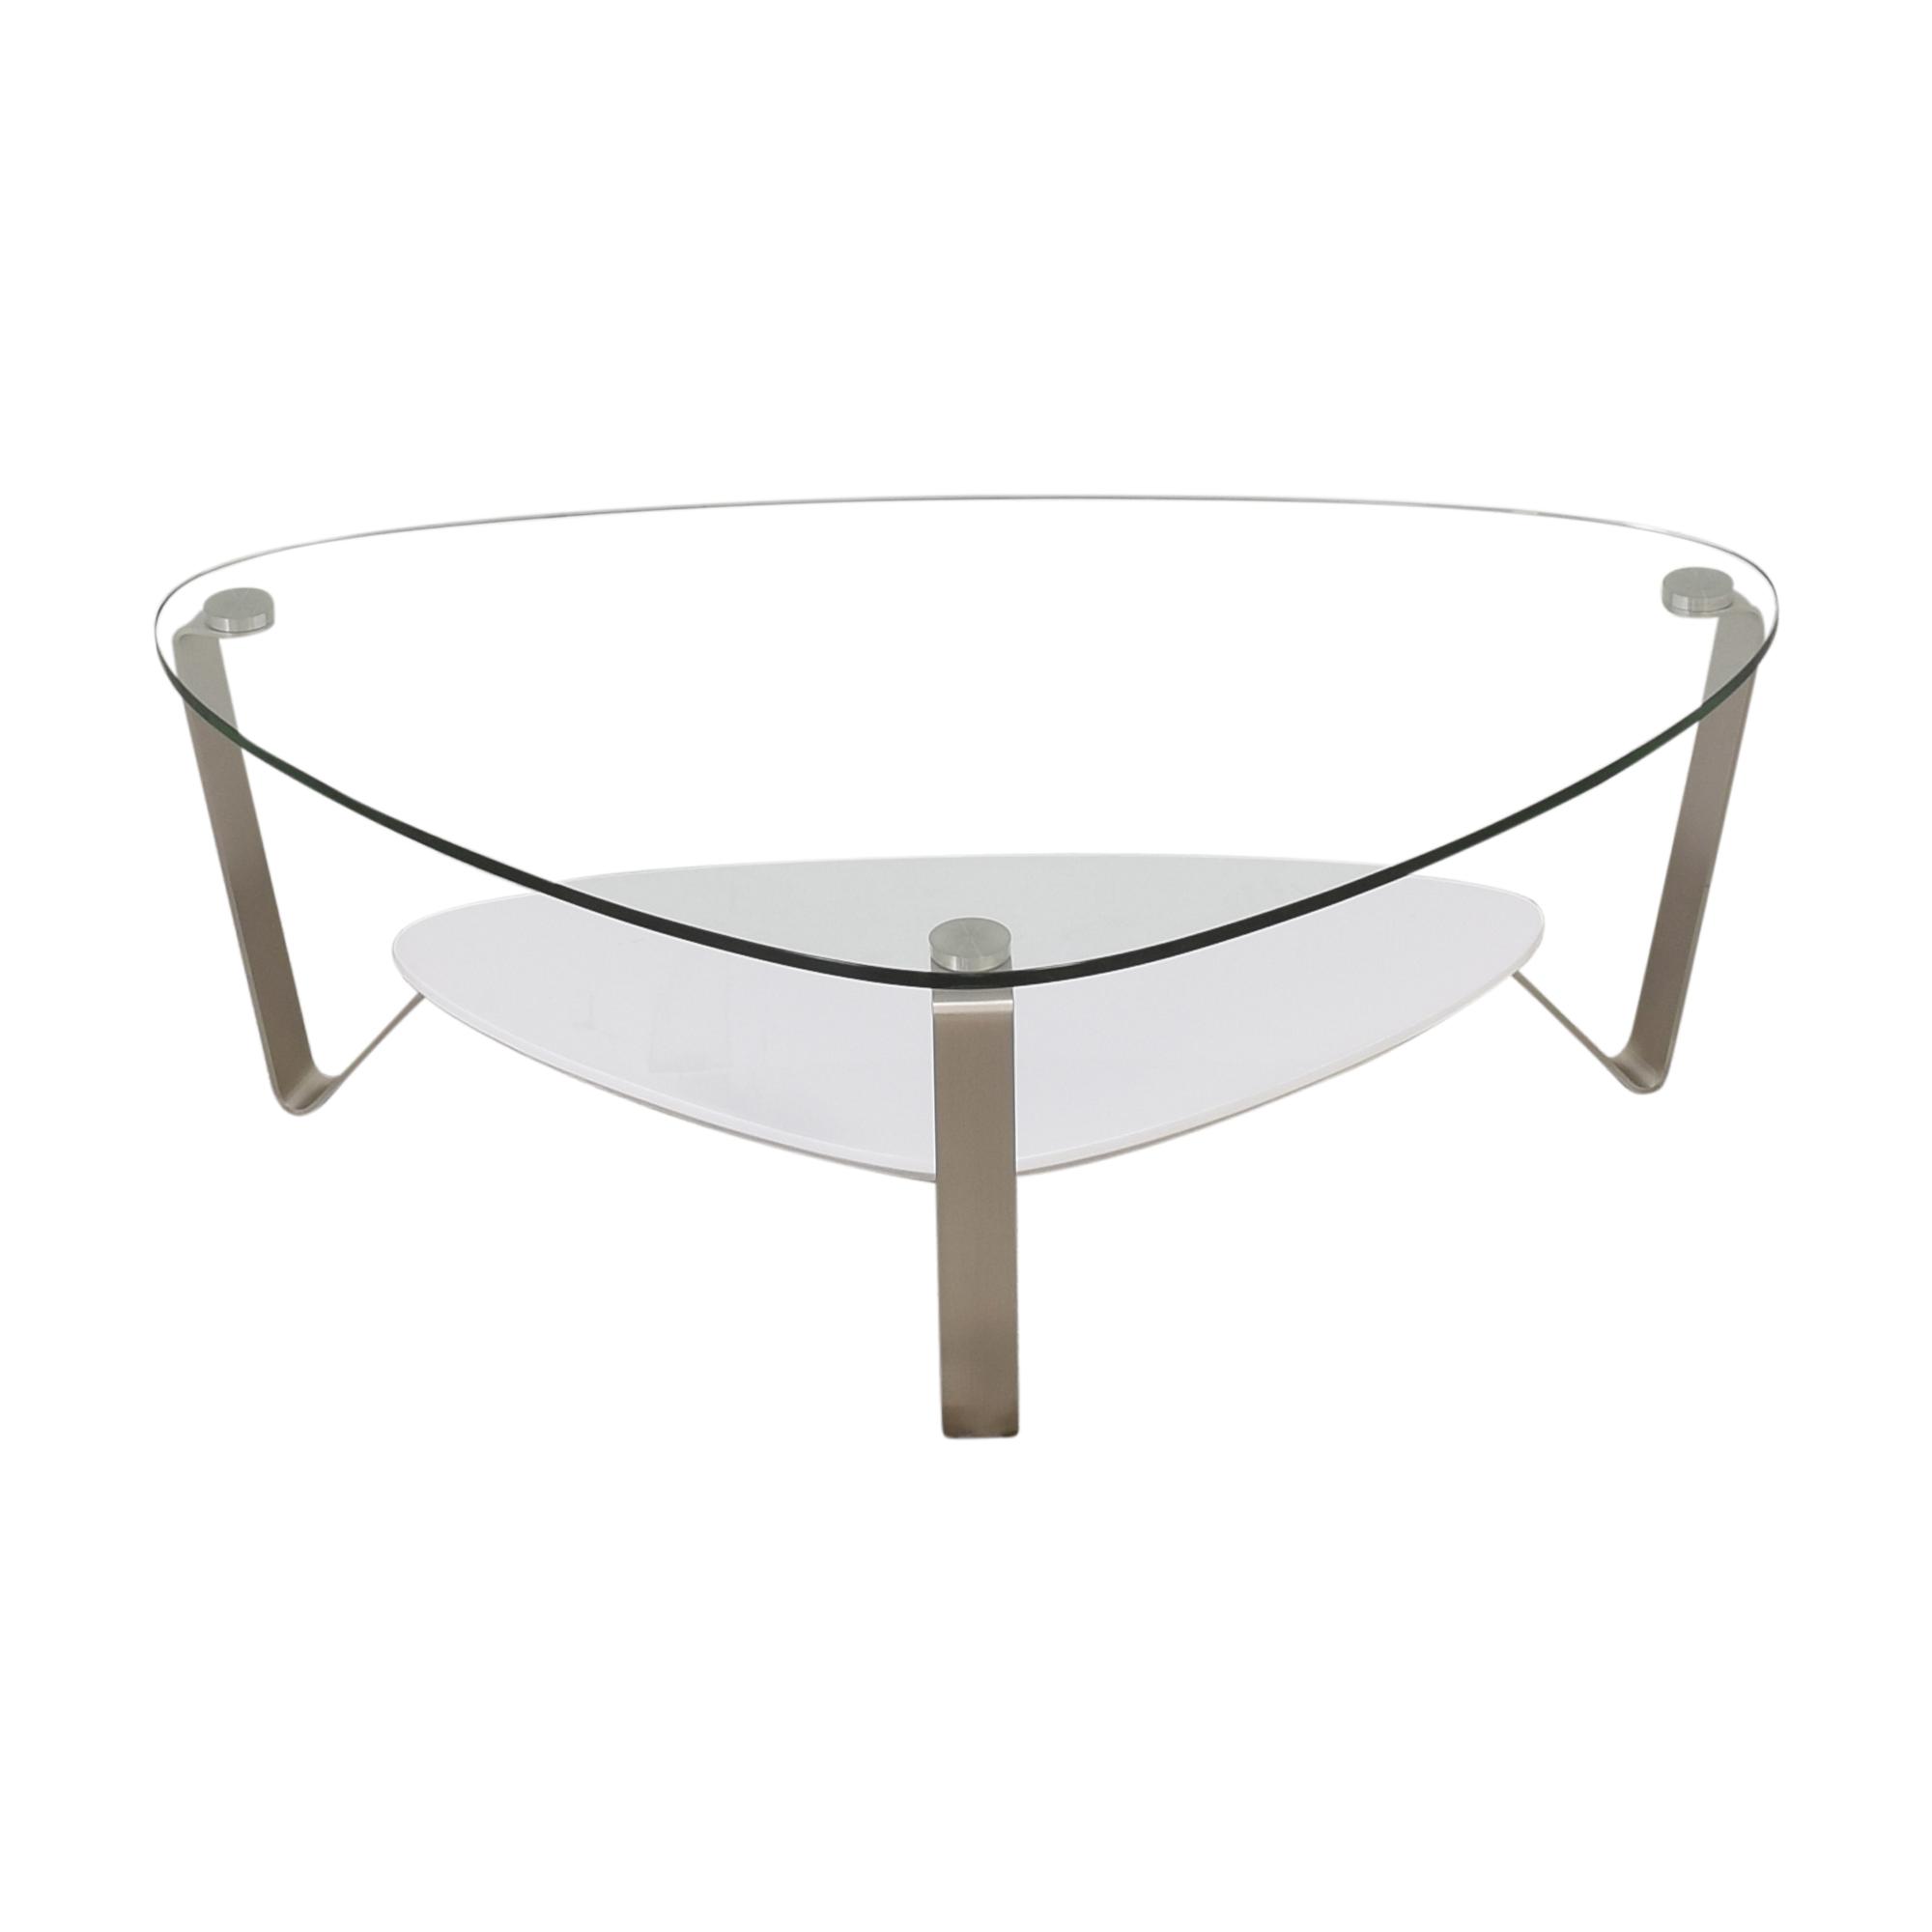 Jensen-Lewis Jensen-Lewis Dino Small Coffee Table dimensions